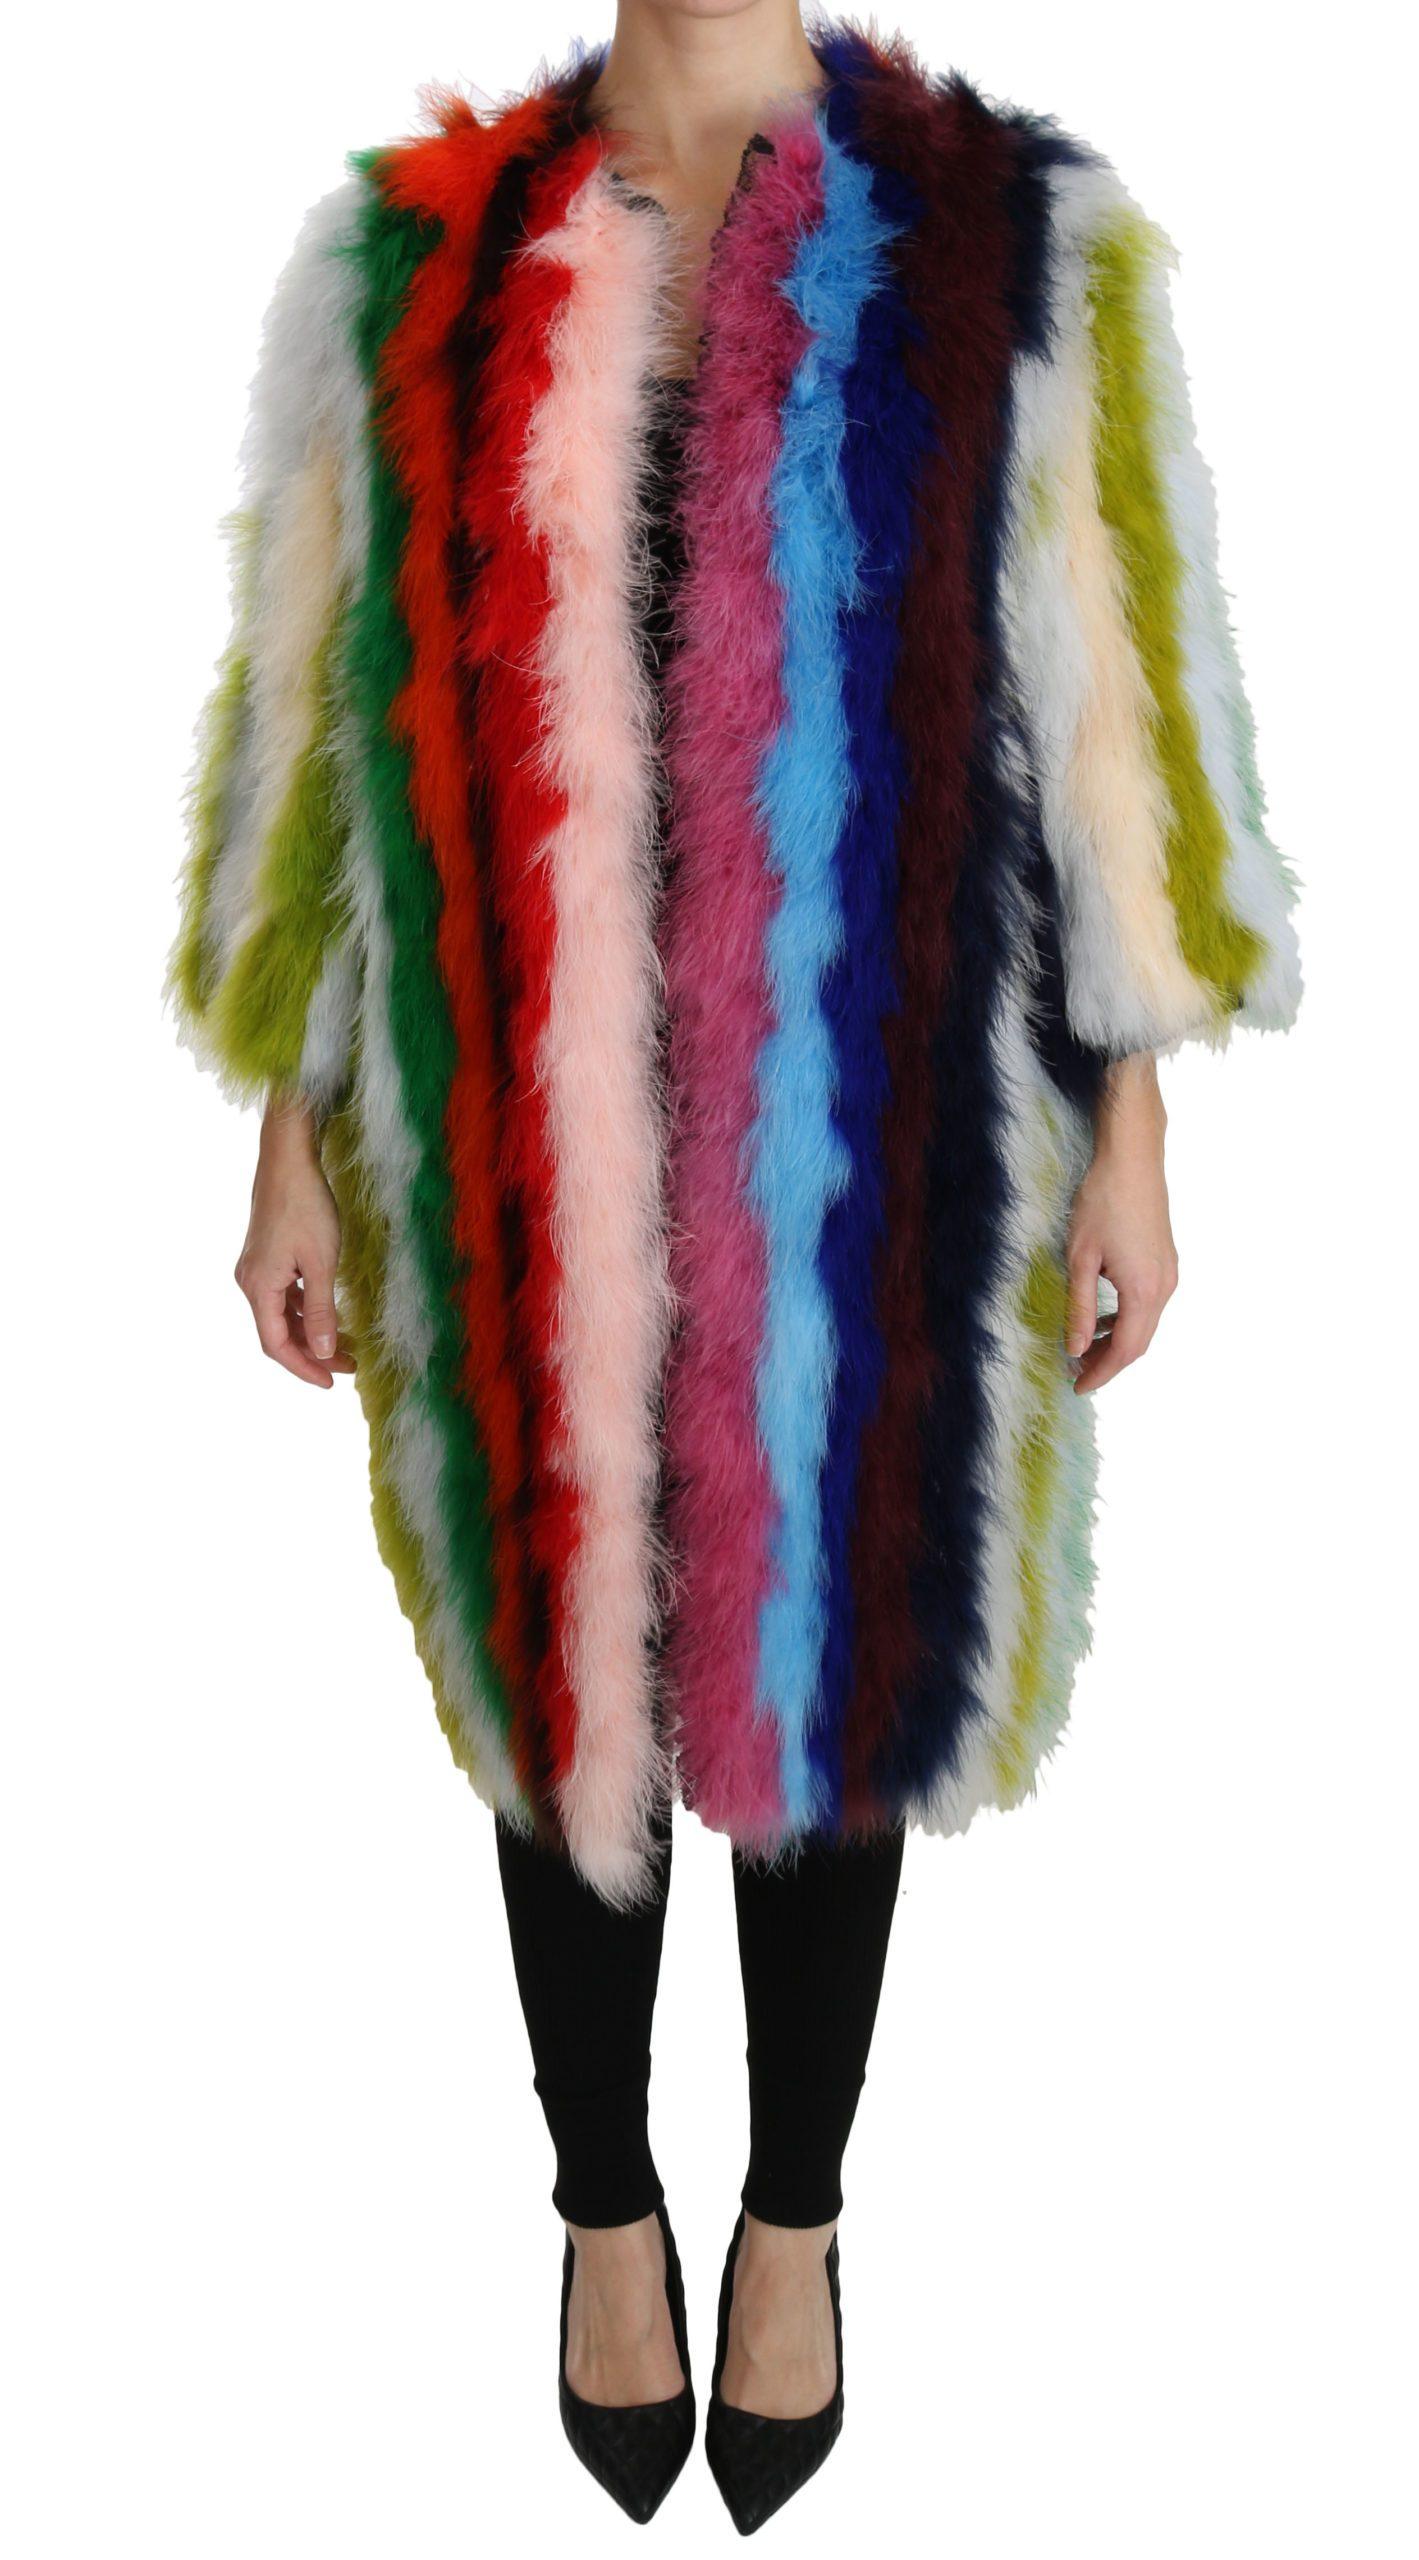 Dolce & Gabbana Women's Turkey Feather Cape Fur Coat Multicolor JKT2511 - IT40|S